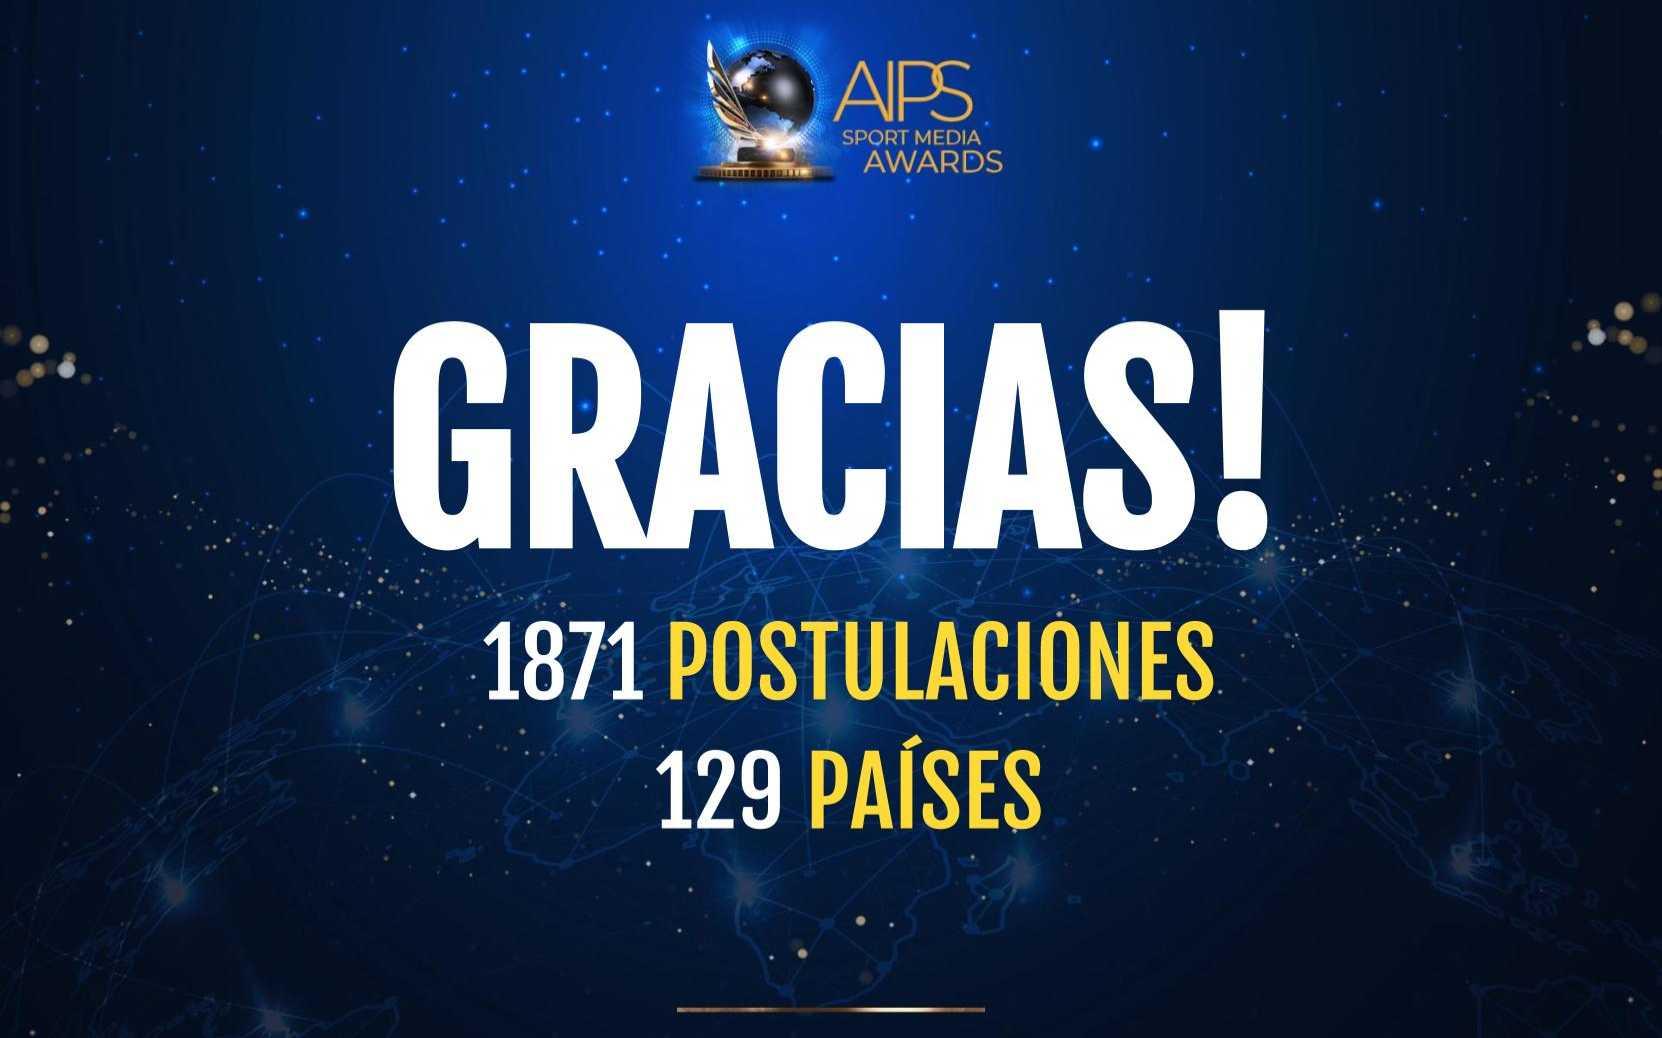 AIPS-PrémiosMedia2020-16-11-2020